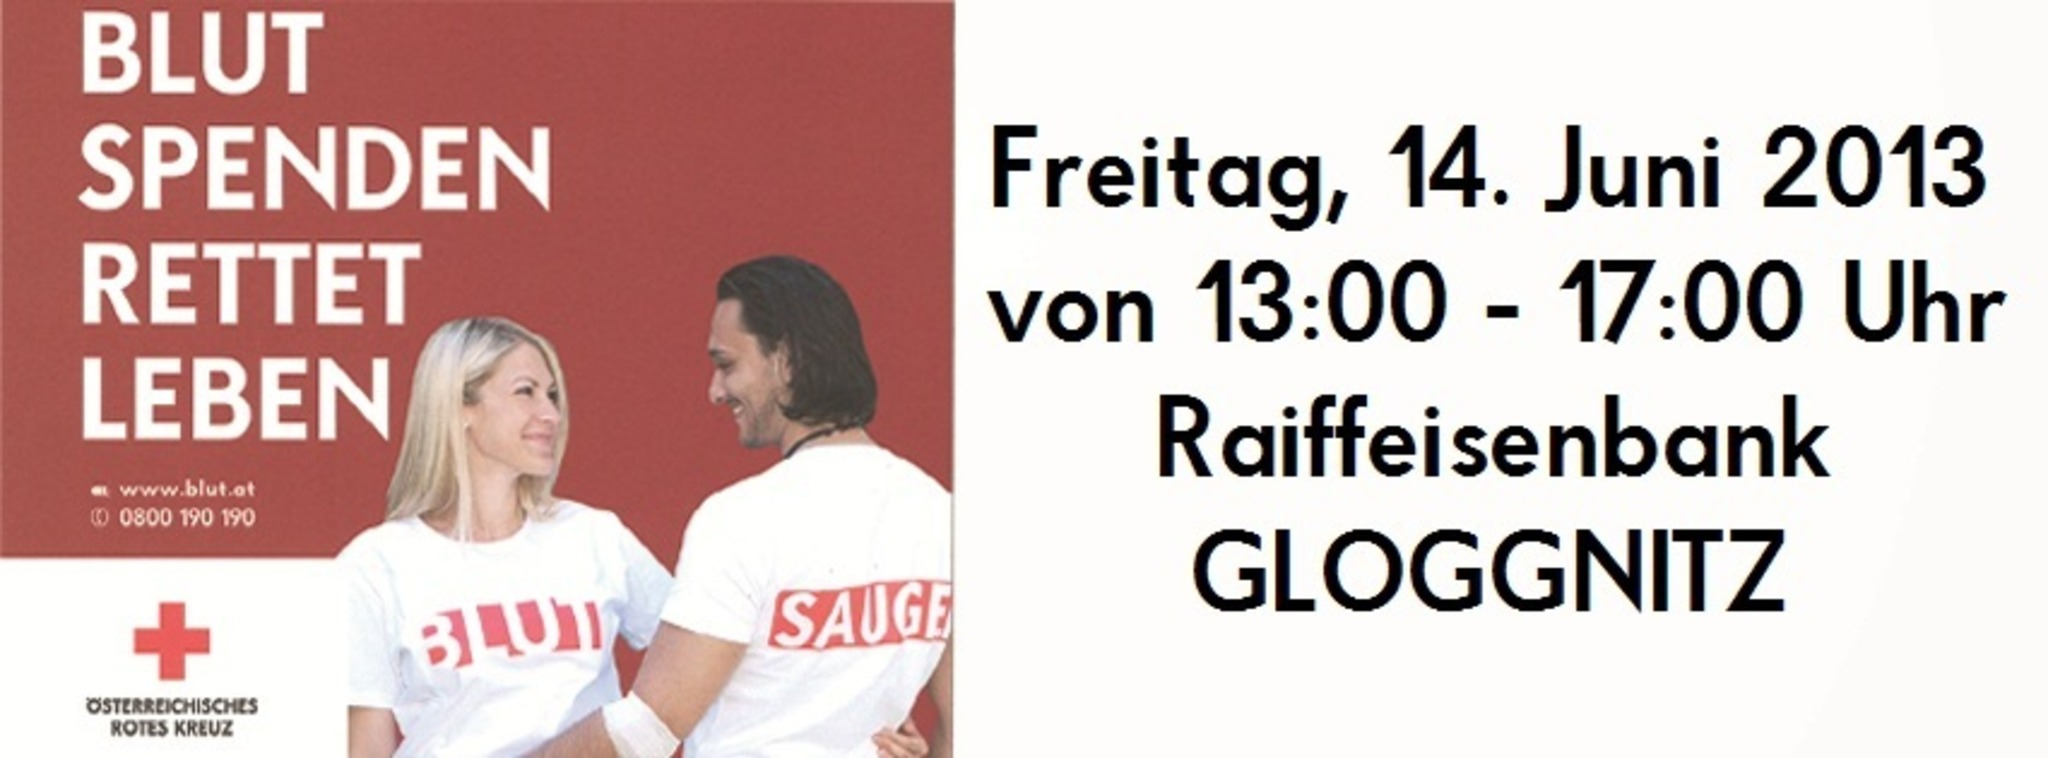 Austria Dating App Gloggnitz Singles